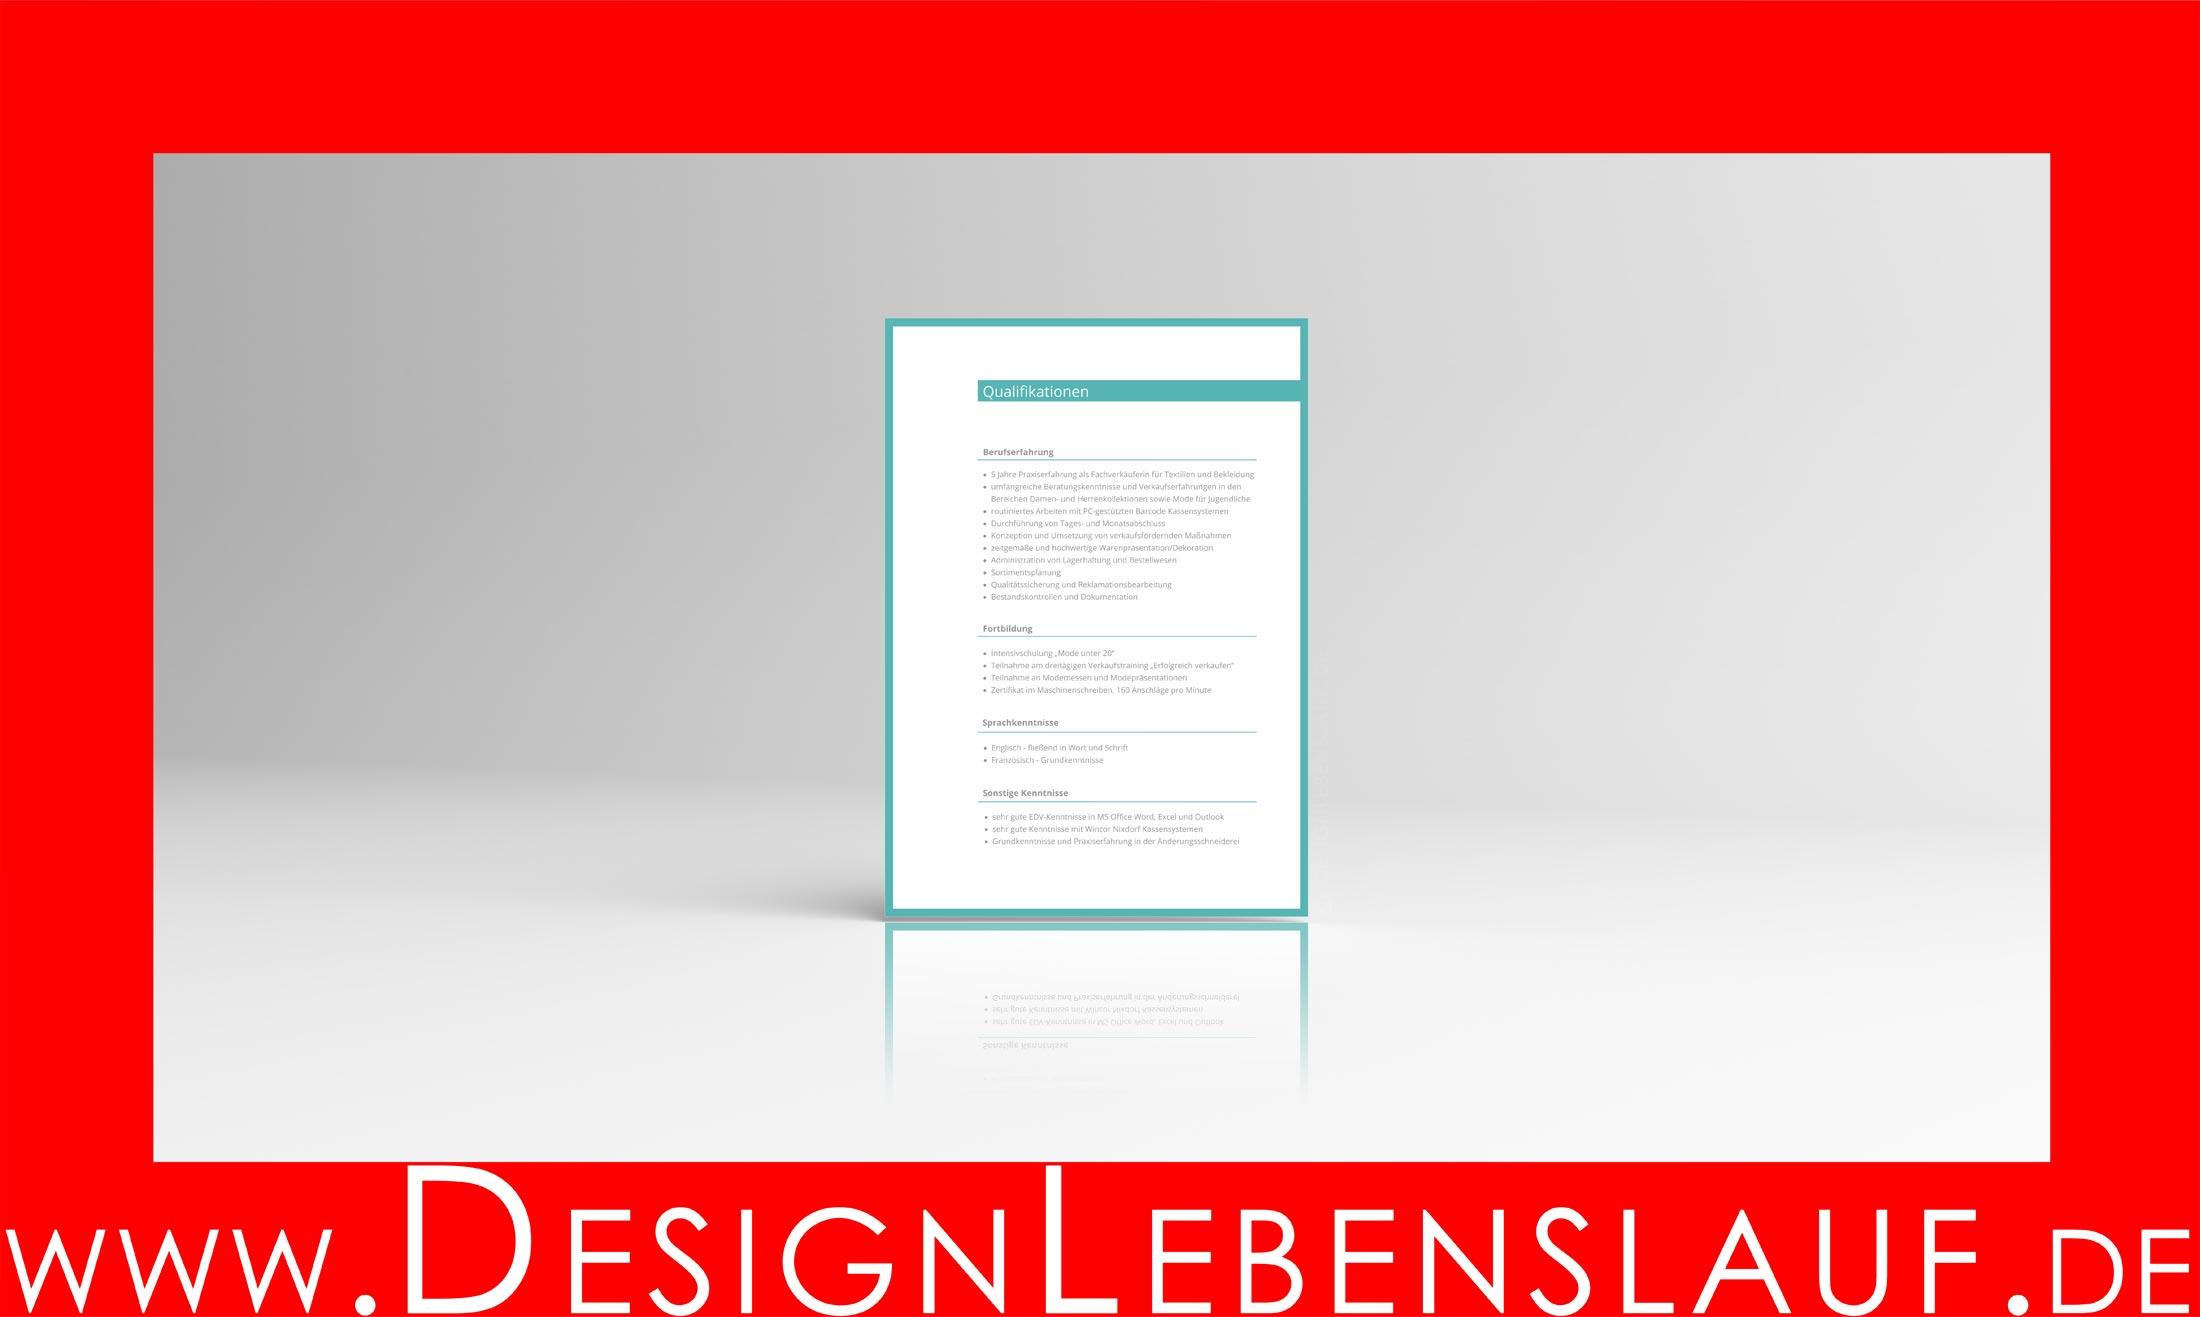 Großzügig Bester Lebenslauf Erbauer Fotos - Entry Level Resume ...